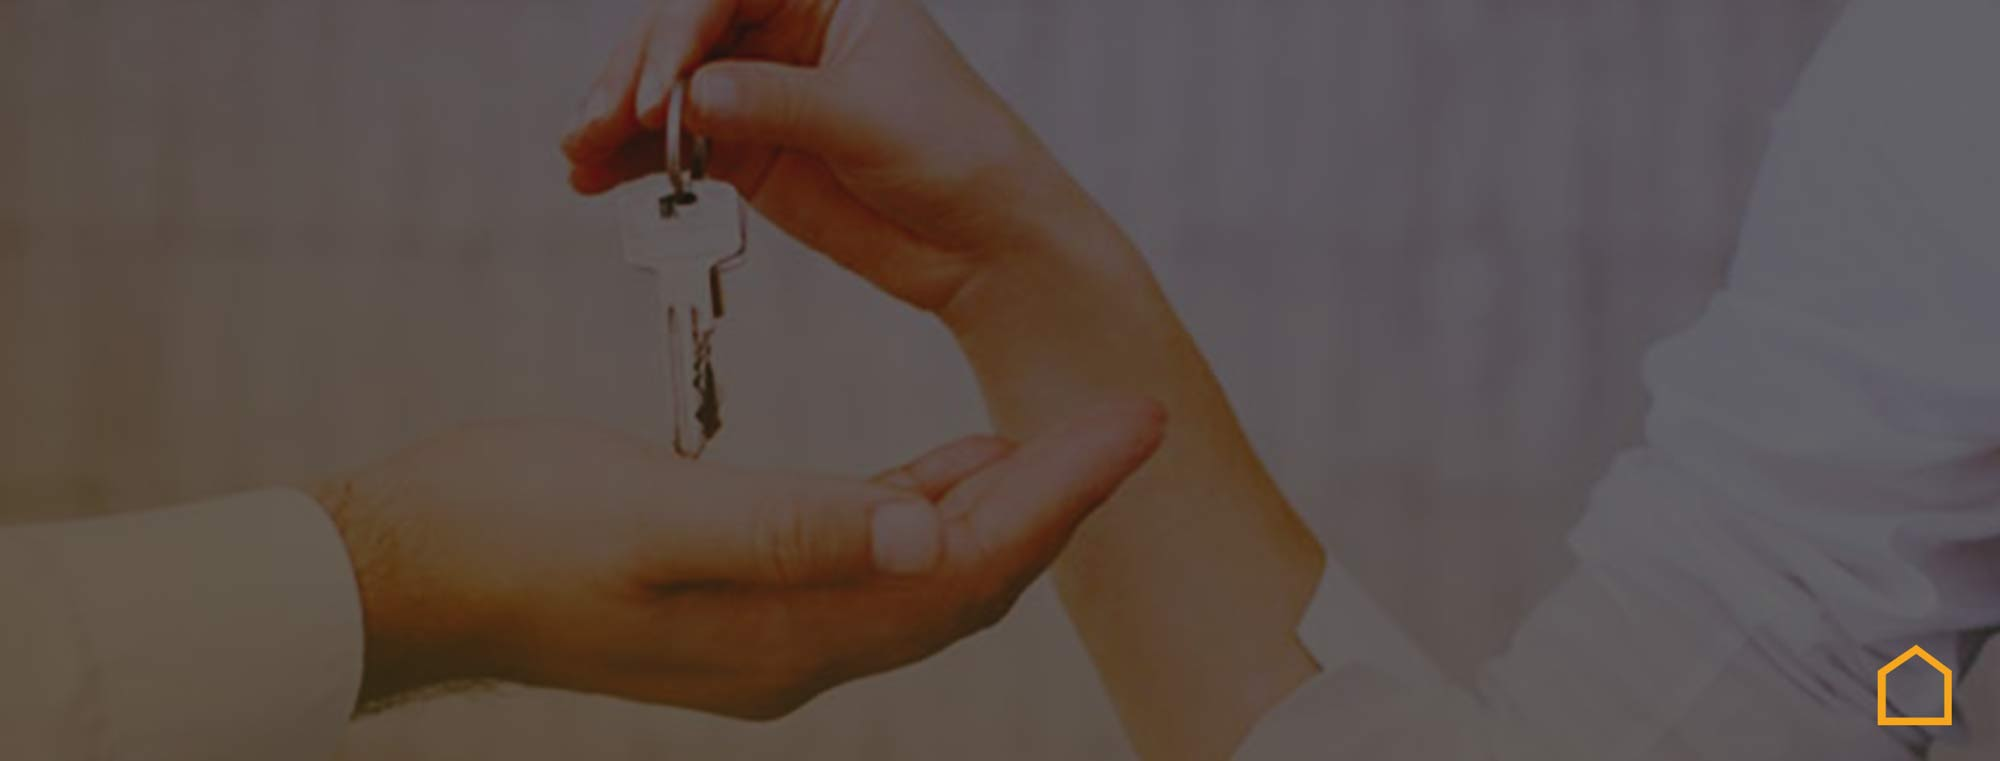 city immobilienmakler lexikon airbnb